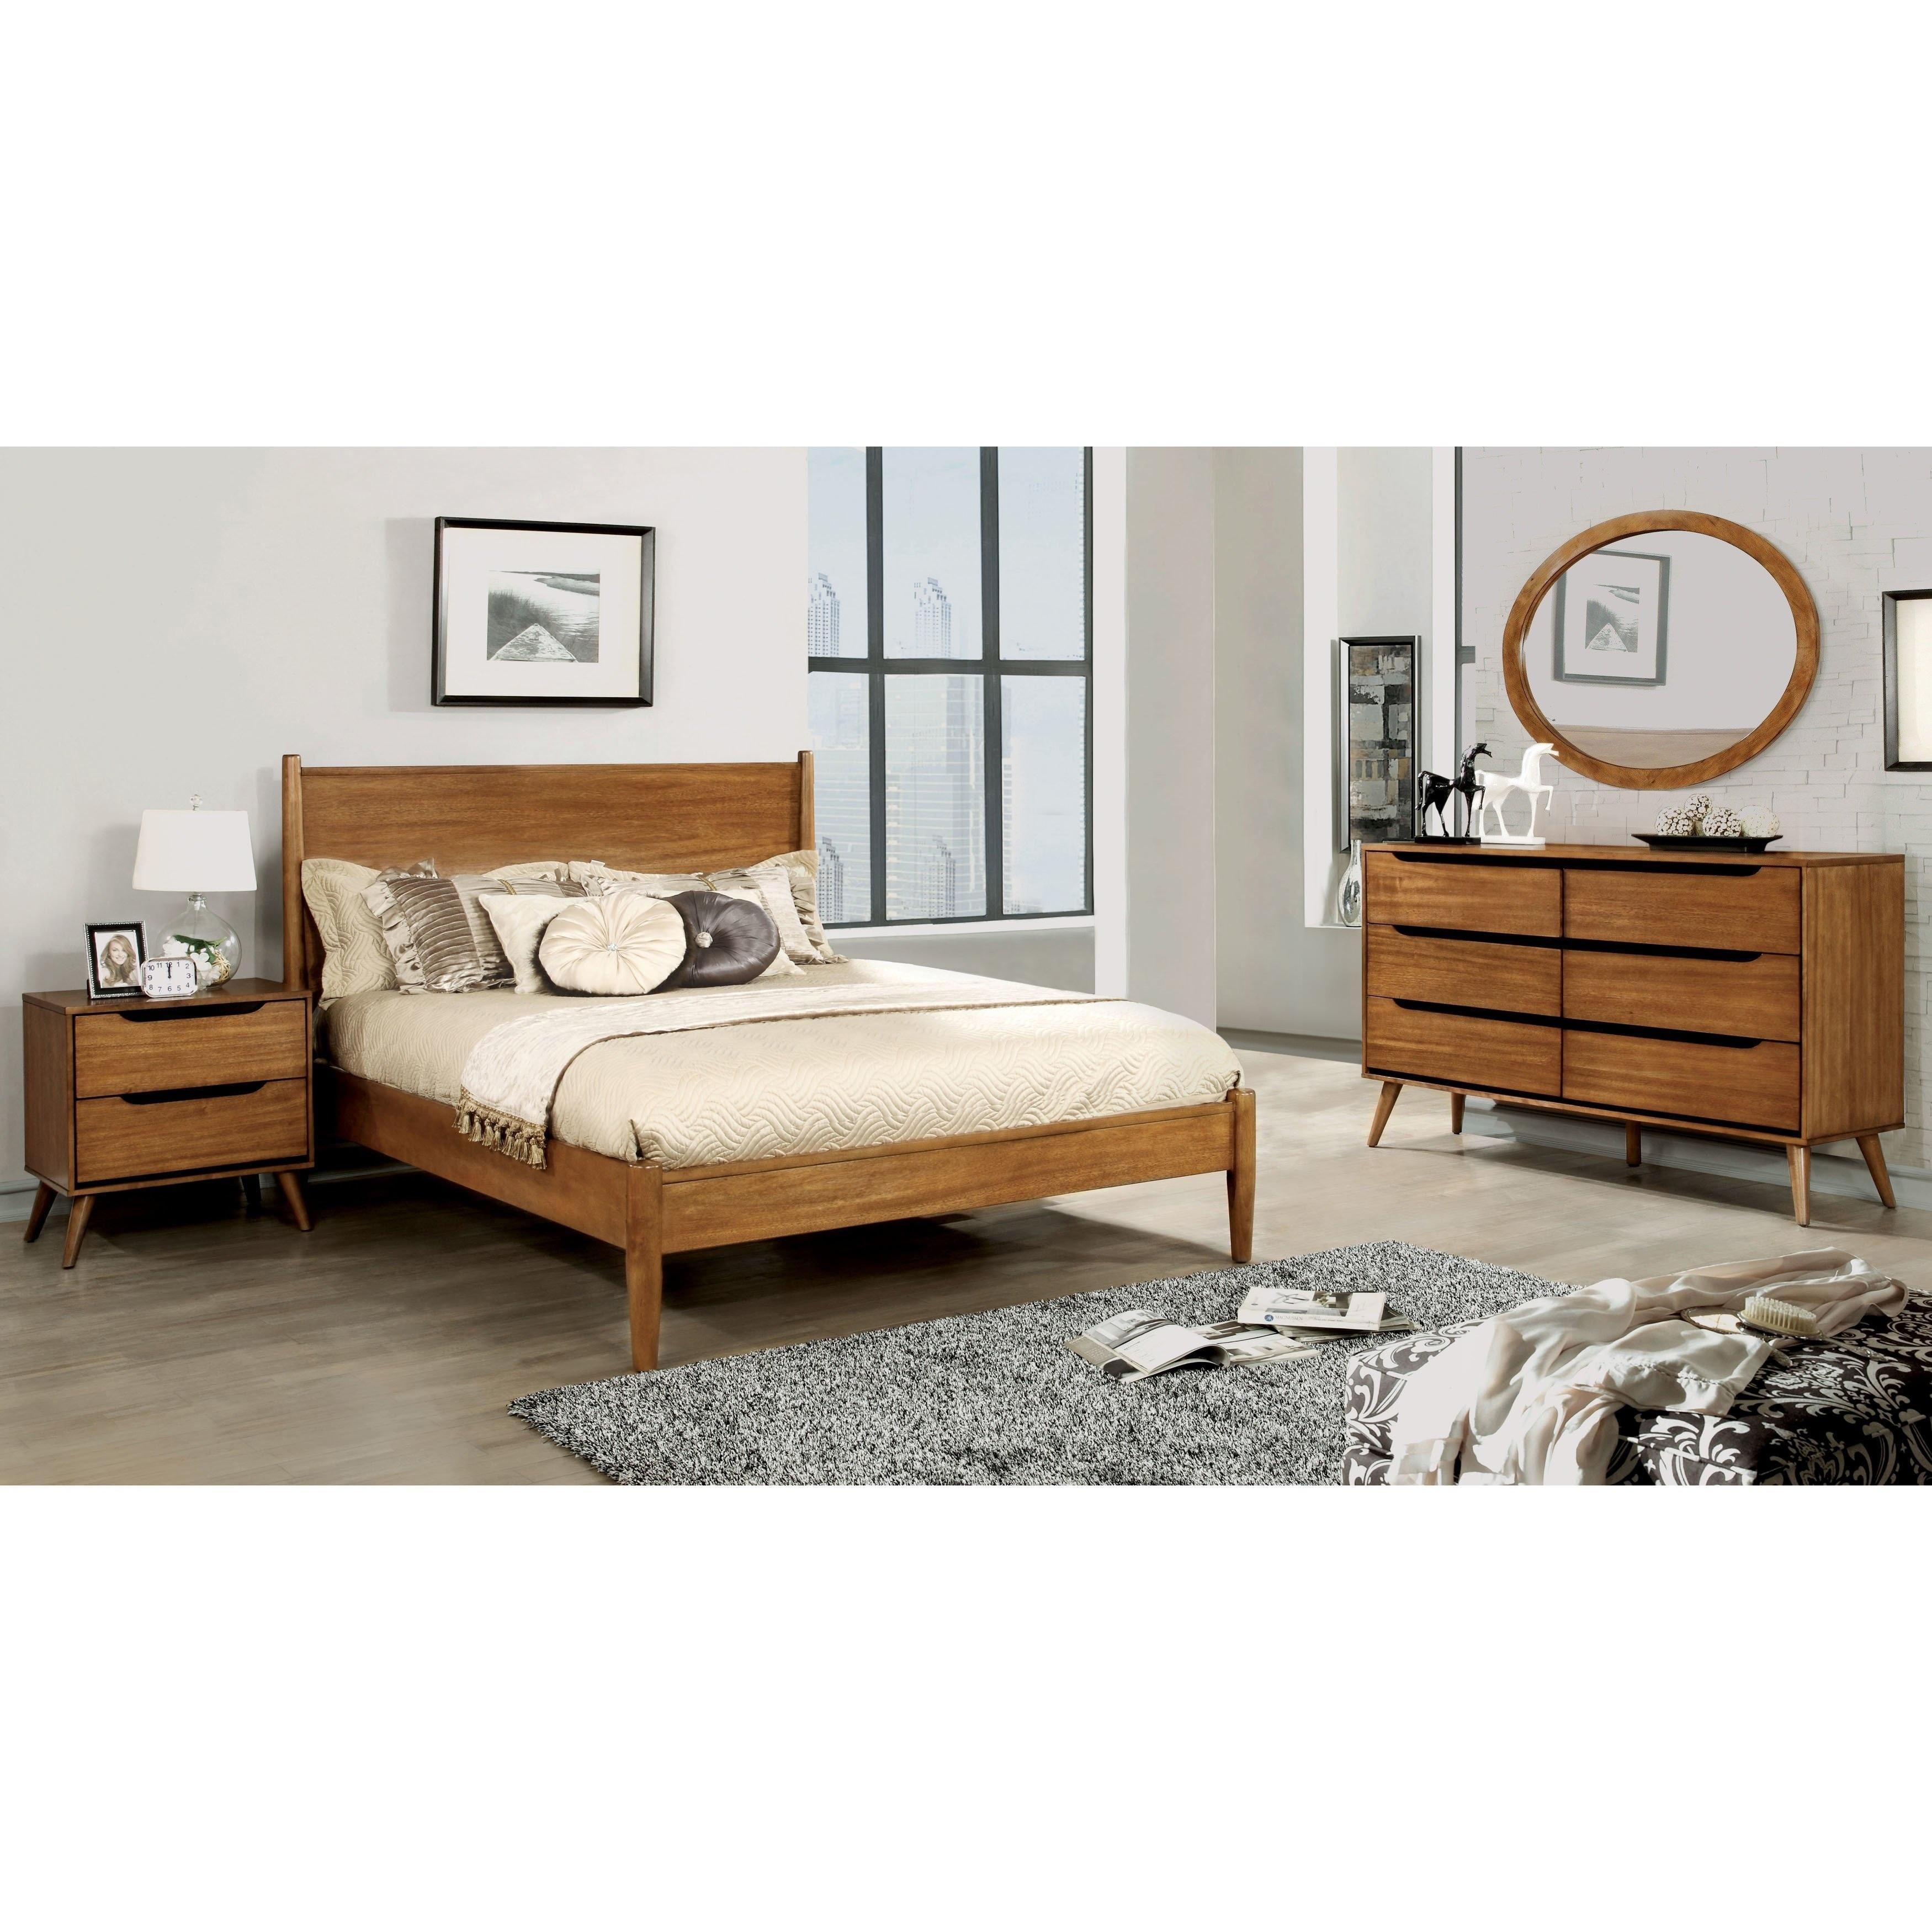 Image of: Shop Black Friday Deals On Furniture Of America Coop Mid Century Black 4 Piece Bedroom Set On Sale Overstock 17666432